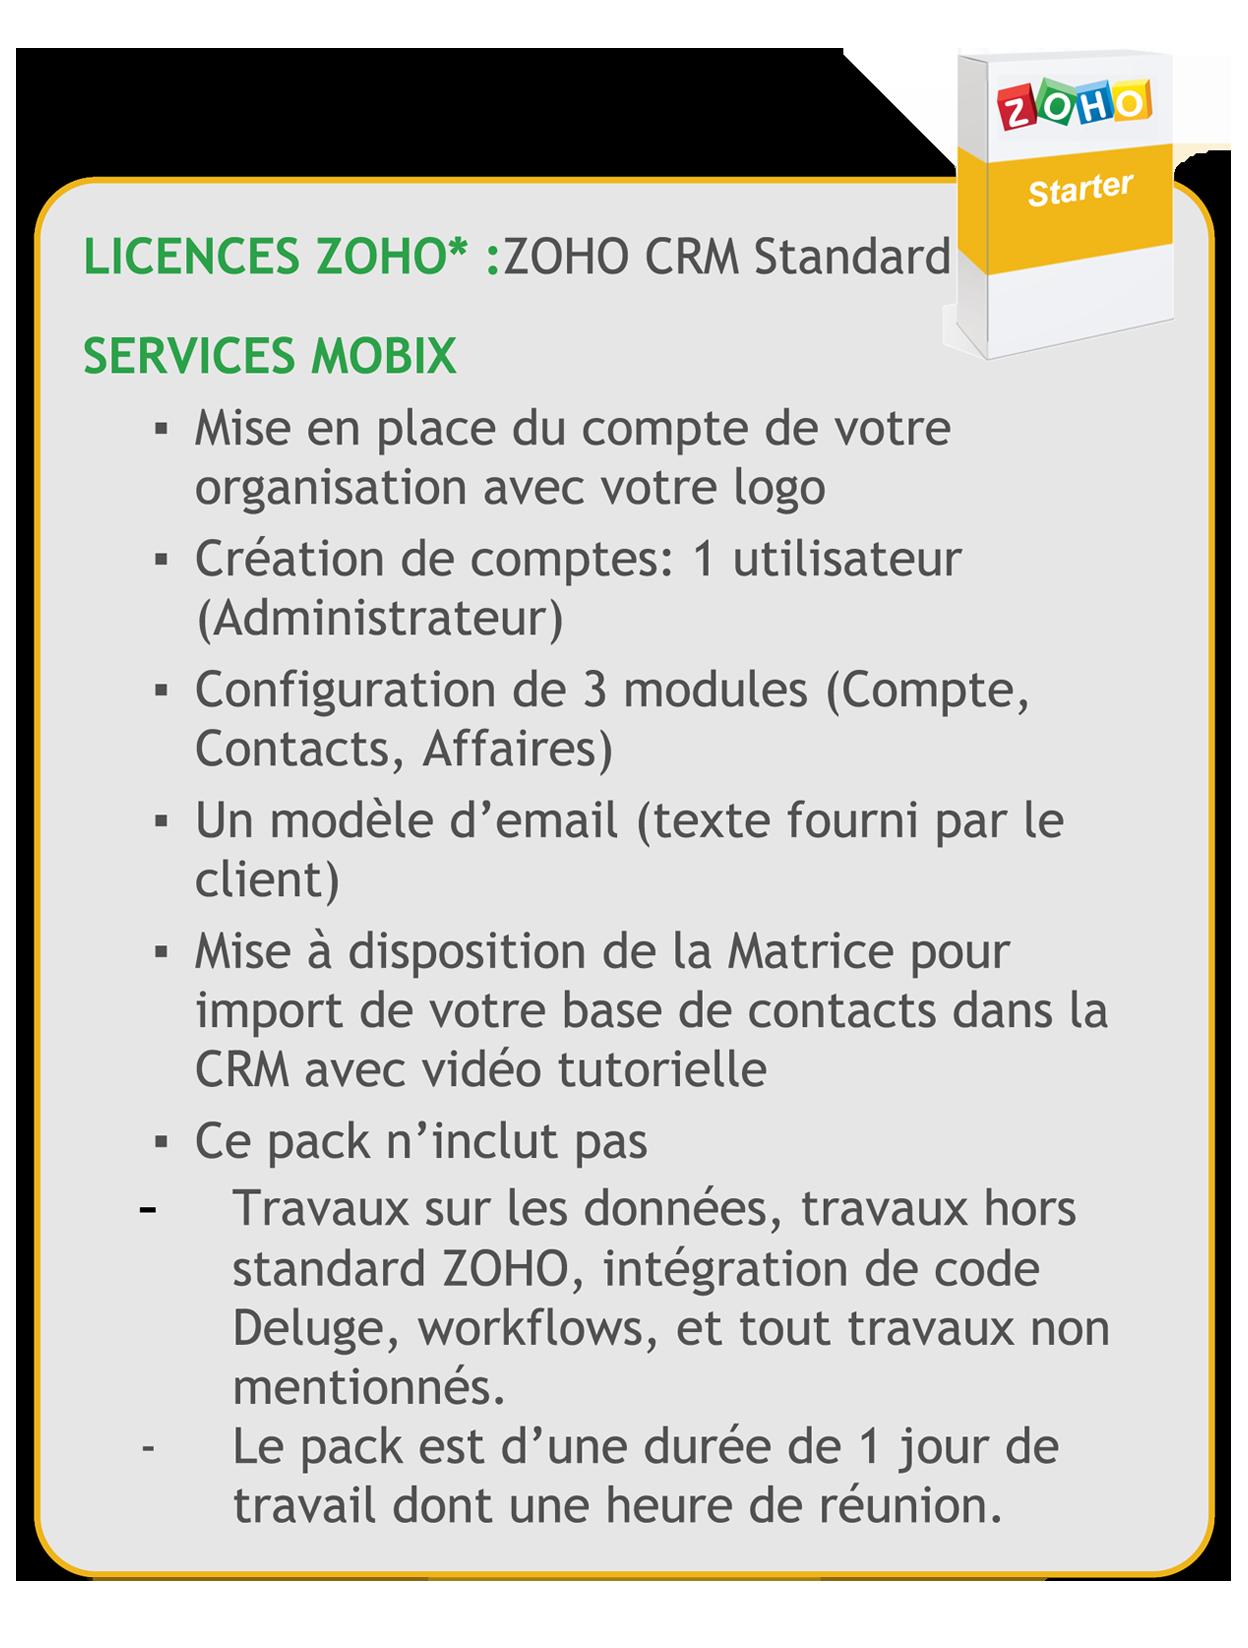 CRM-ZOHO-starter-details update